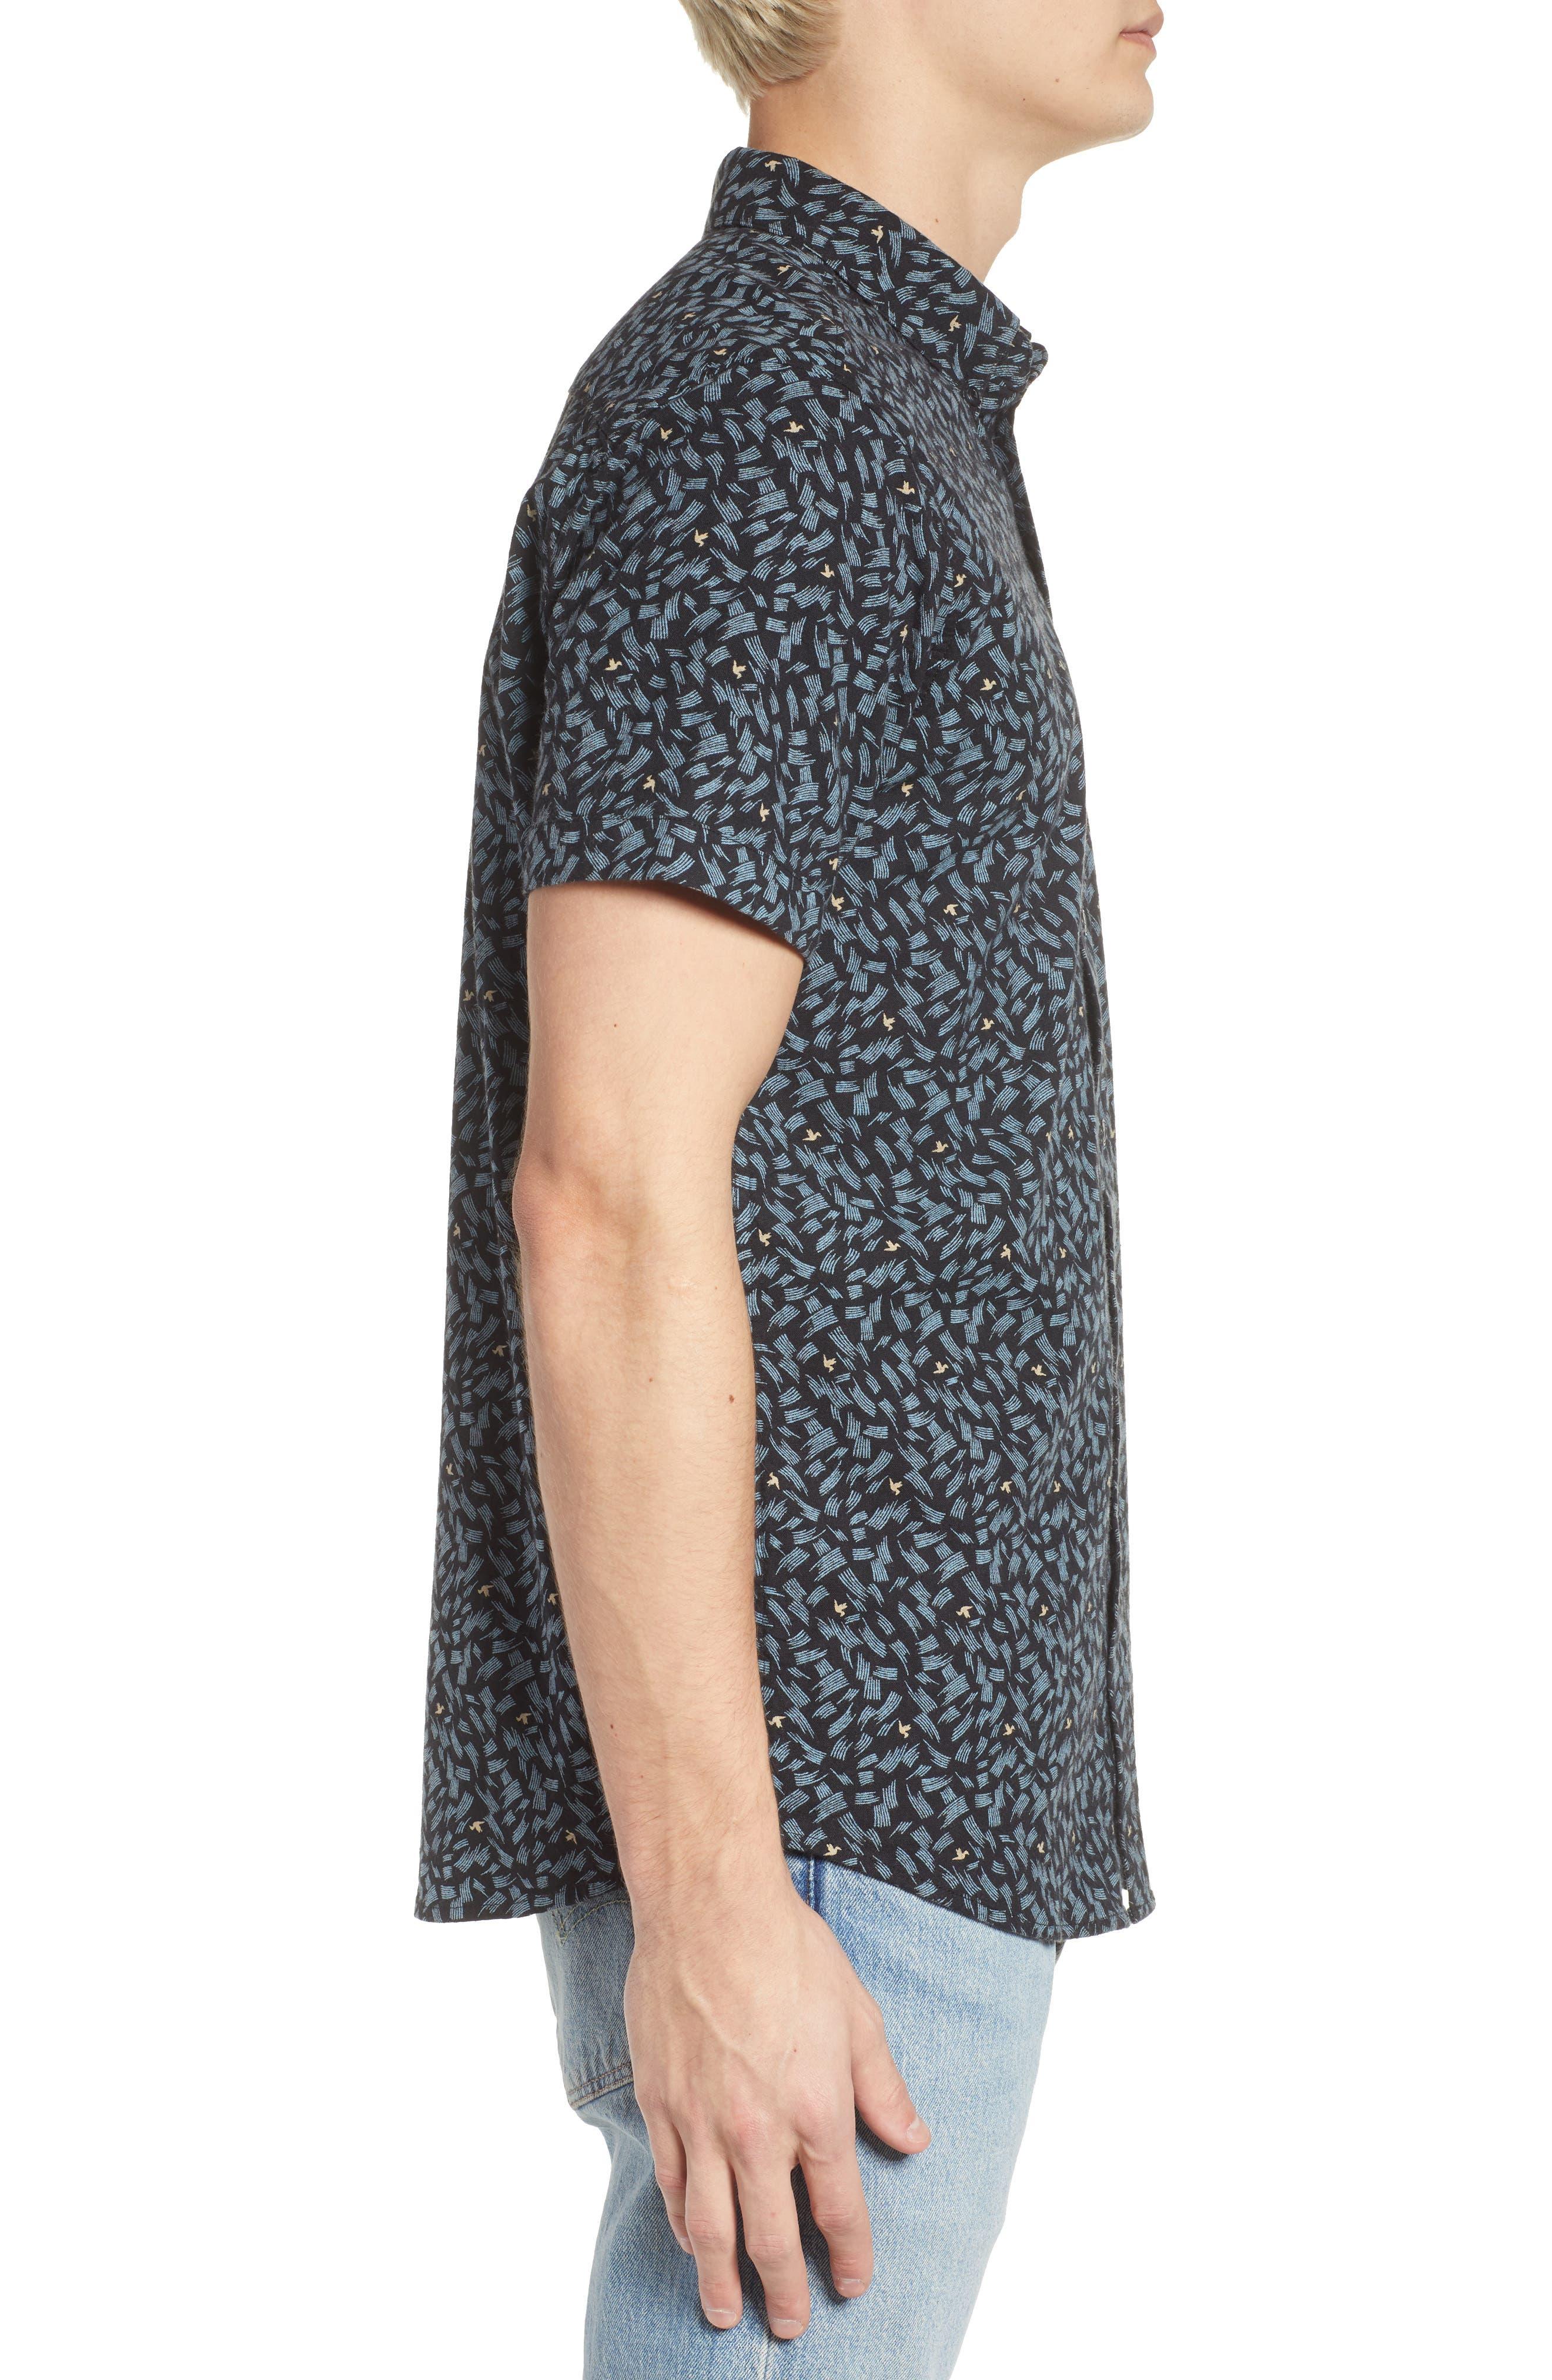 Northern Short Sleeve Shirt,                             Alternate thumbnail 3, color,                             001